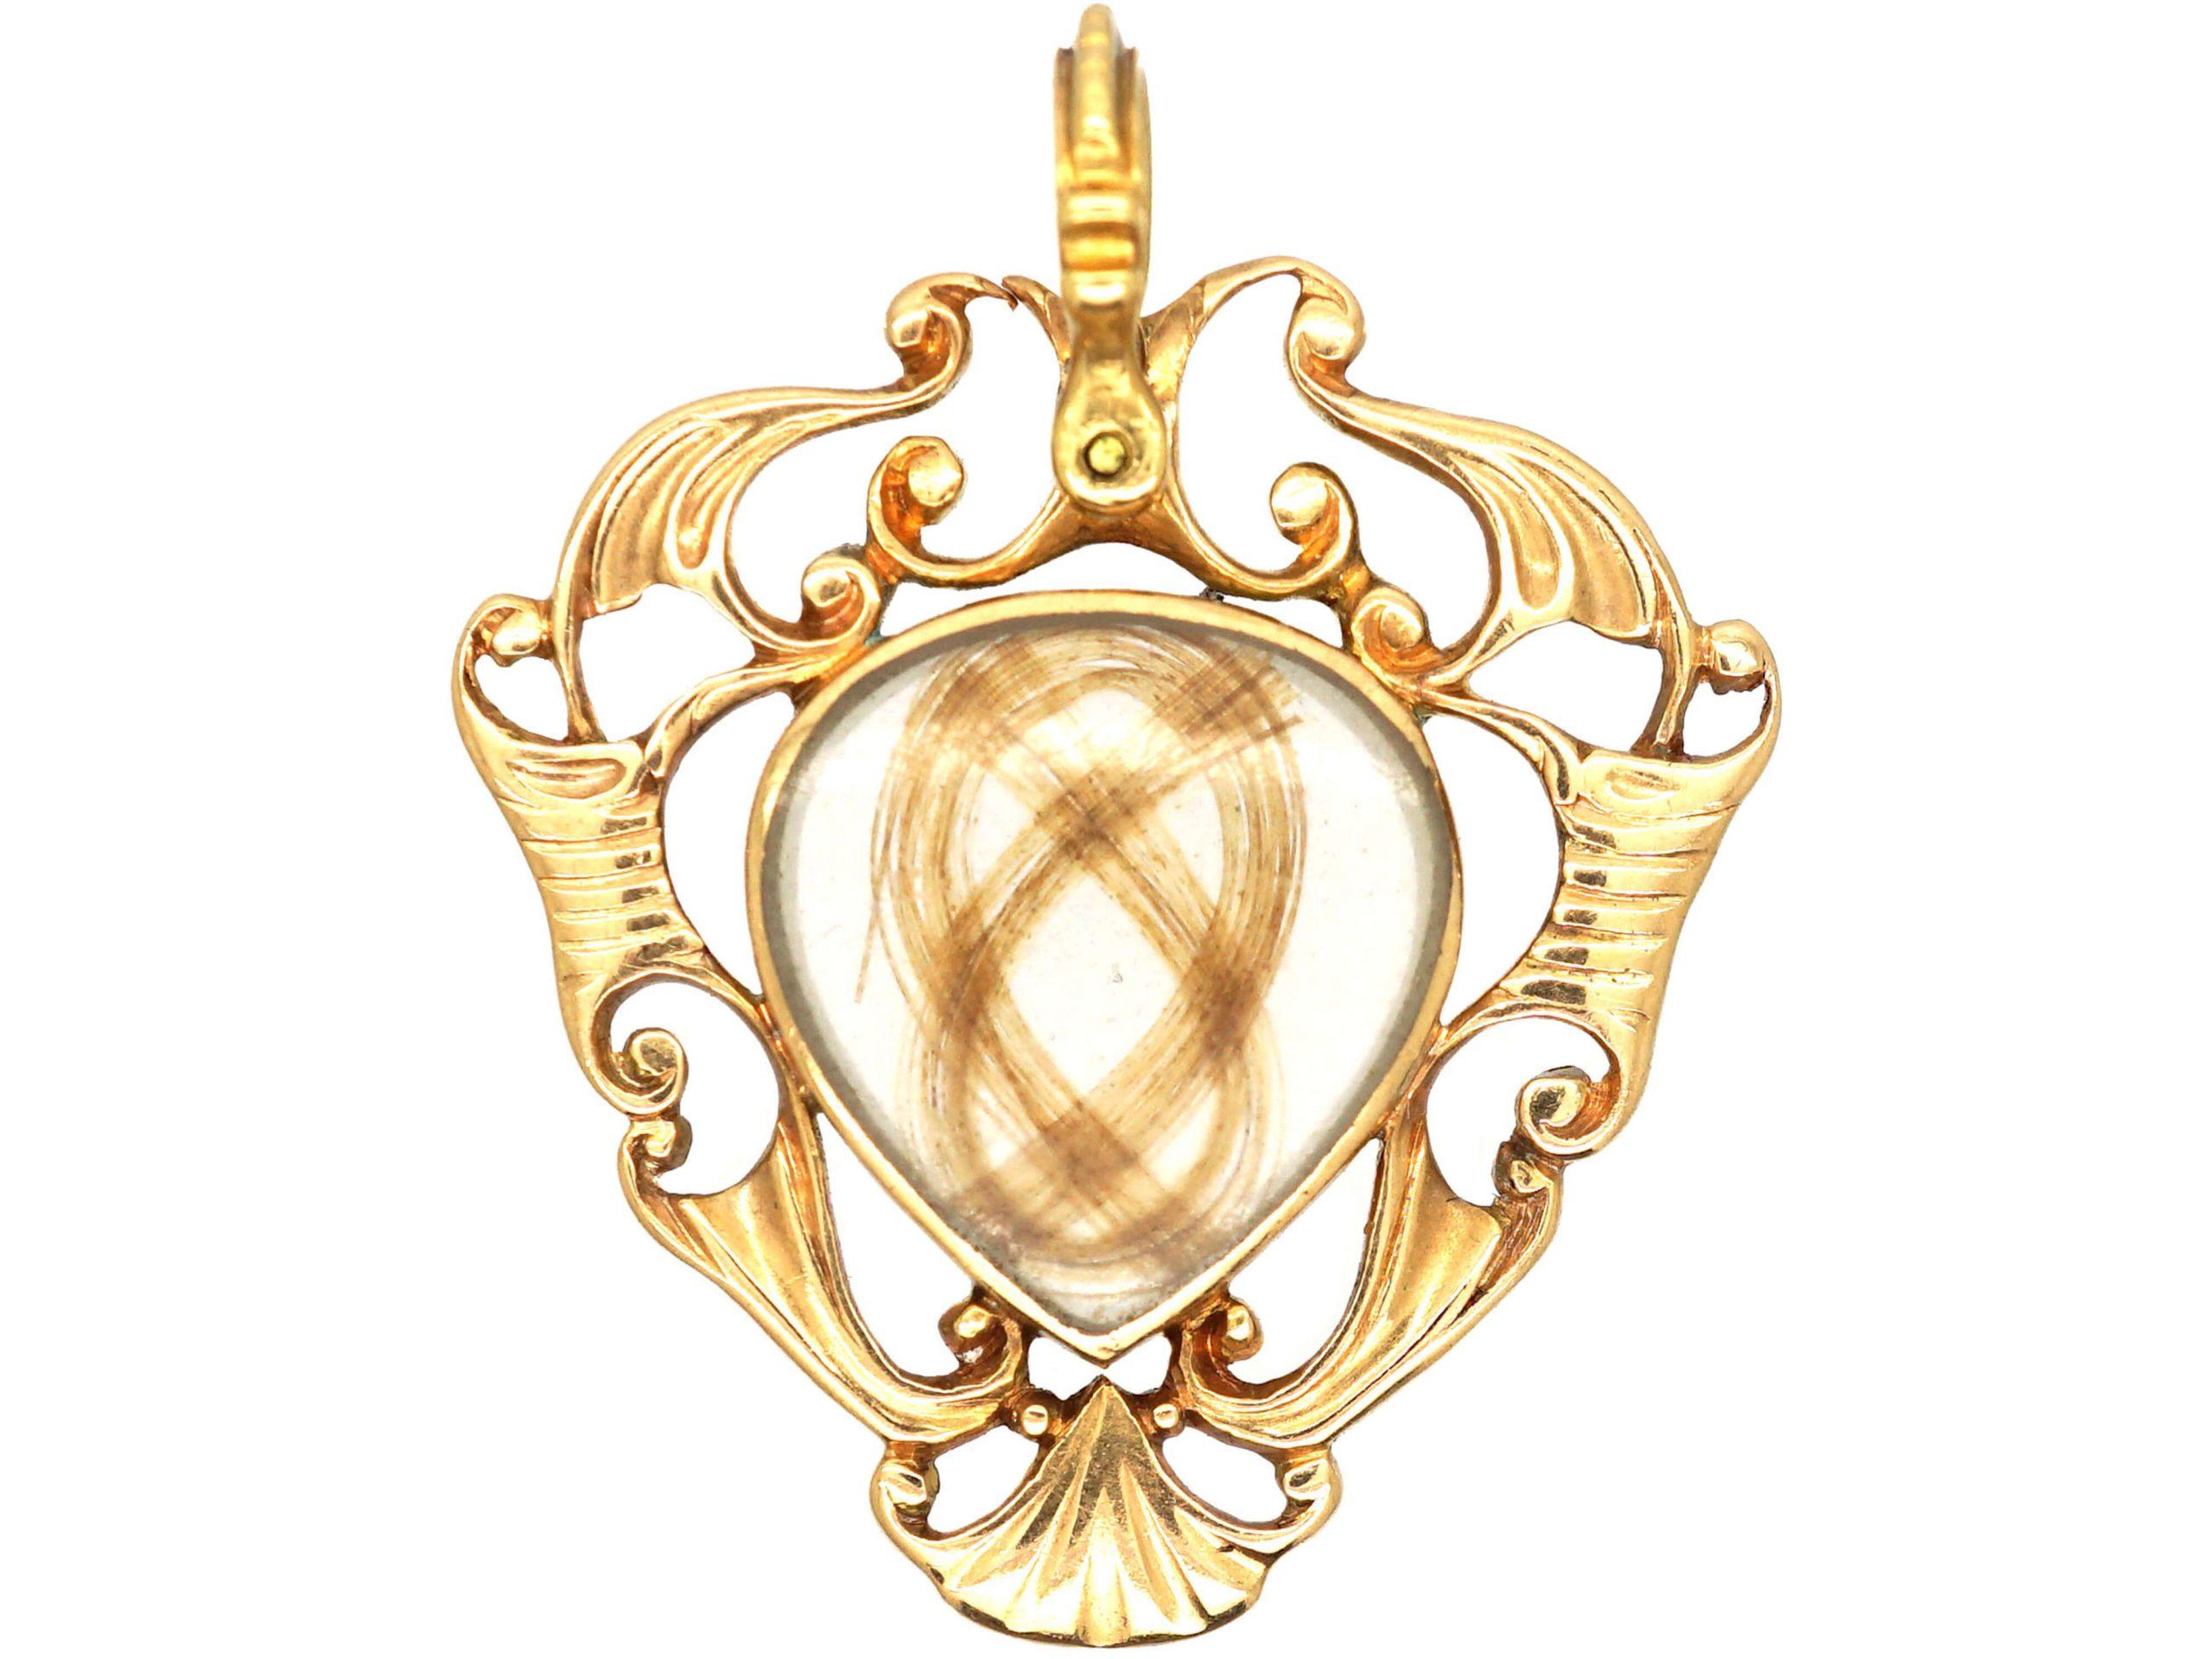 Georgian 18ct Gold Heart Shaped Pendant by Thomas Flach